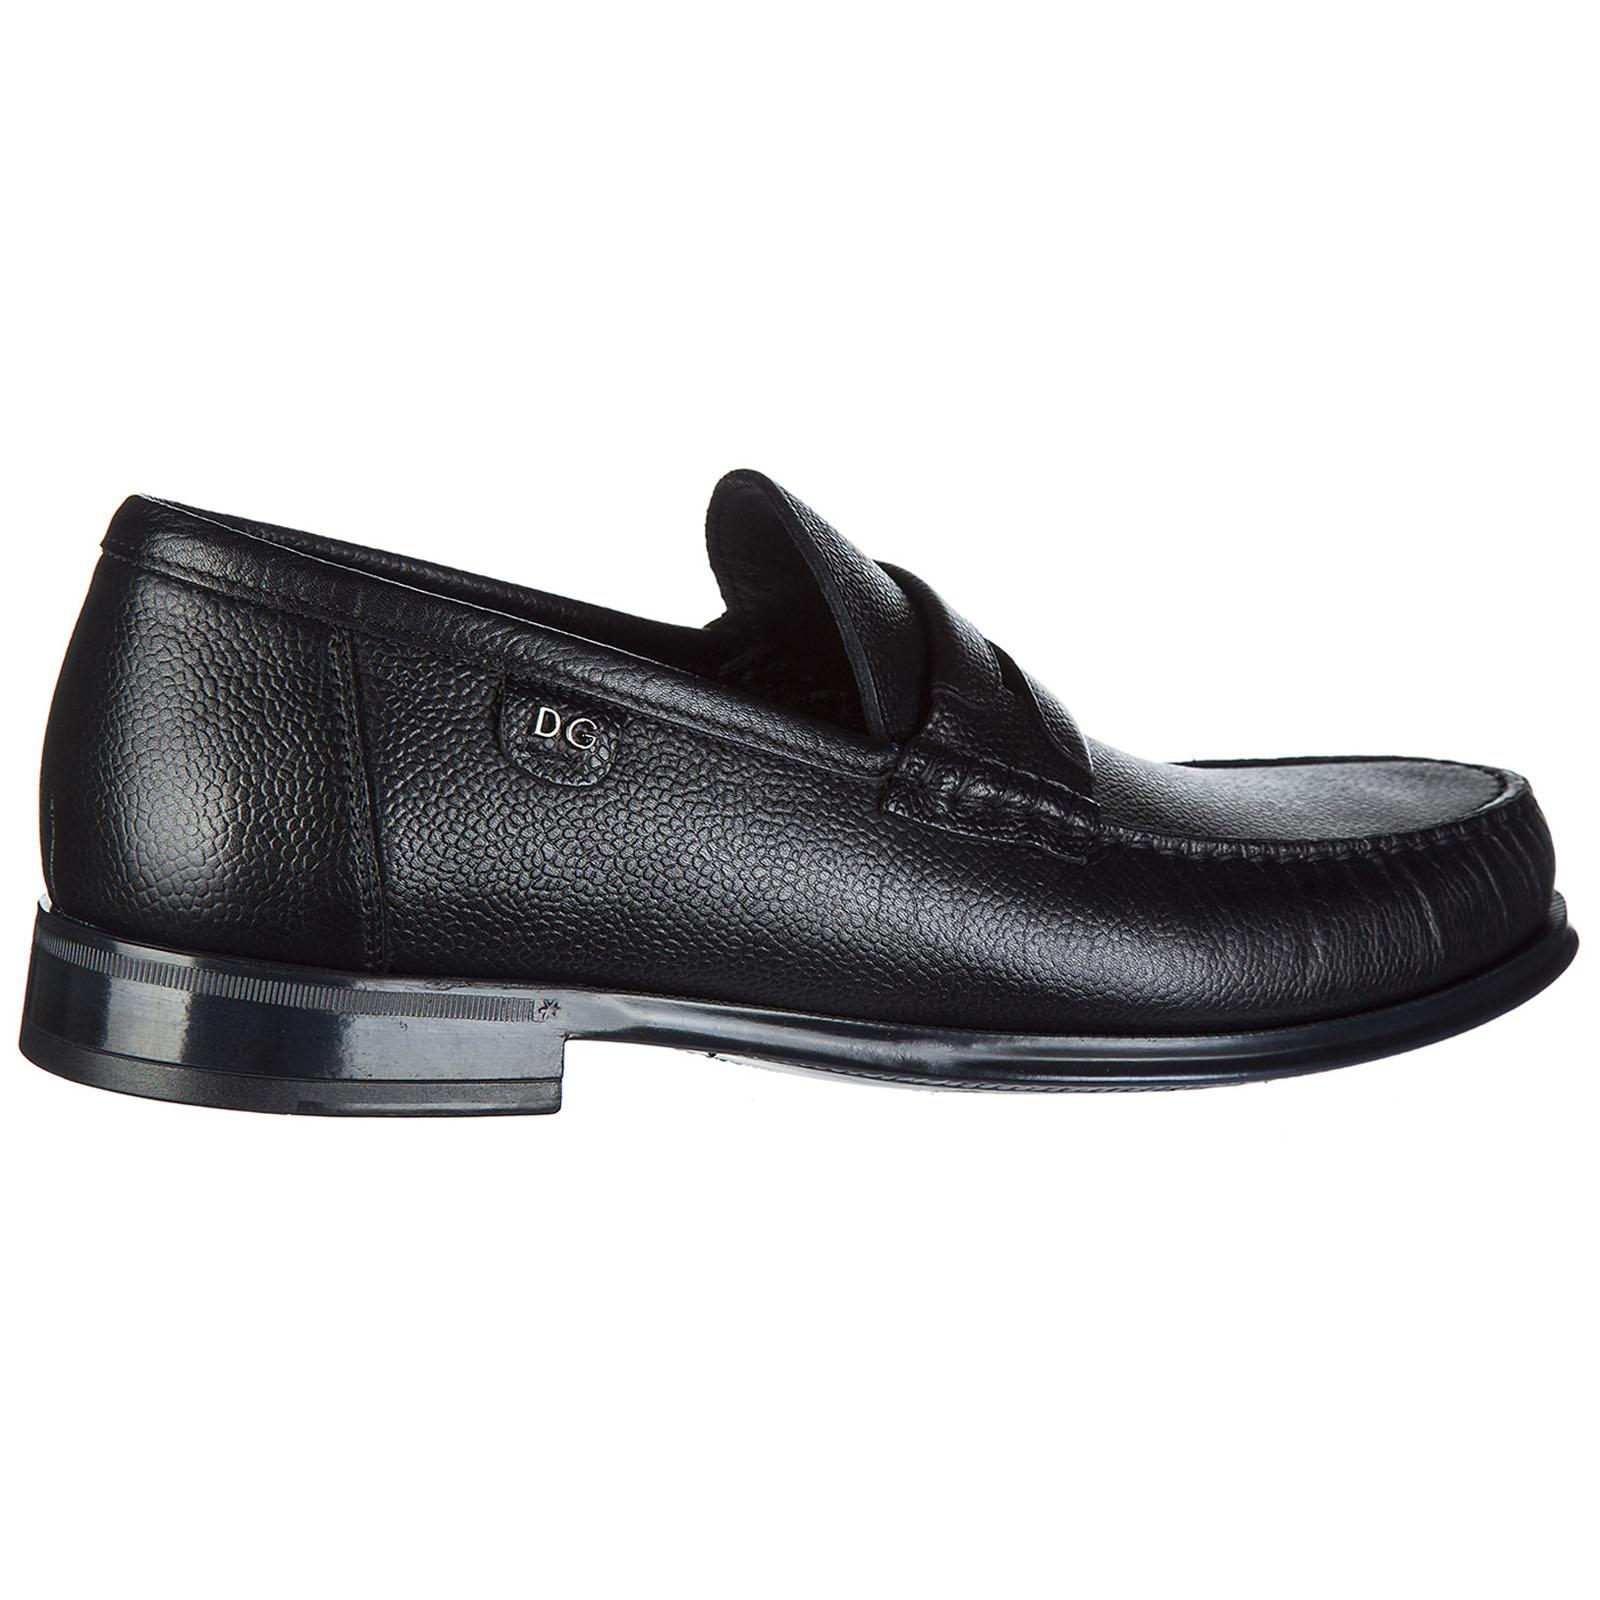 Dolce & Gabbana Men's Leather Loafers Moccasins Bramante in Nero (Black) for Men